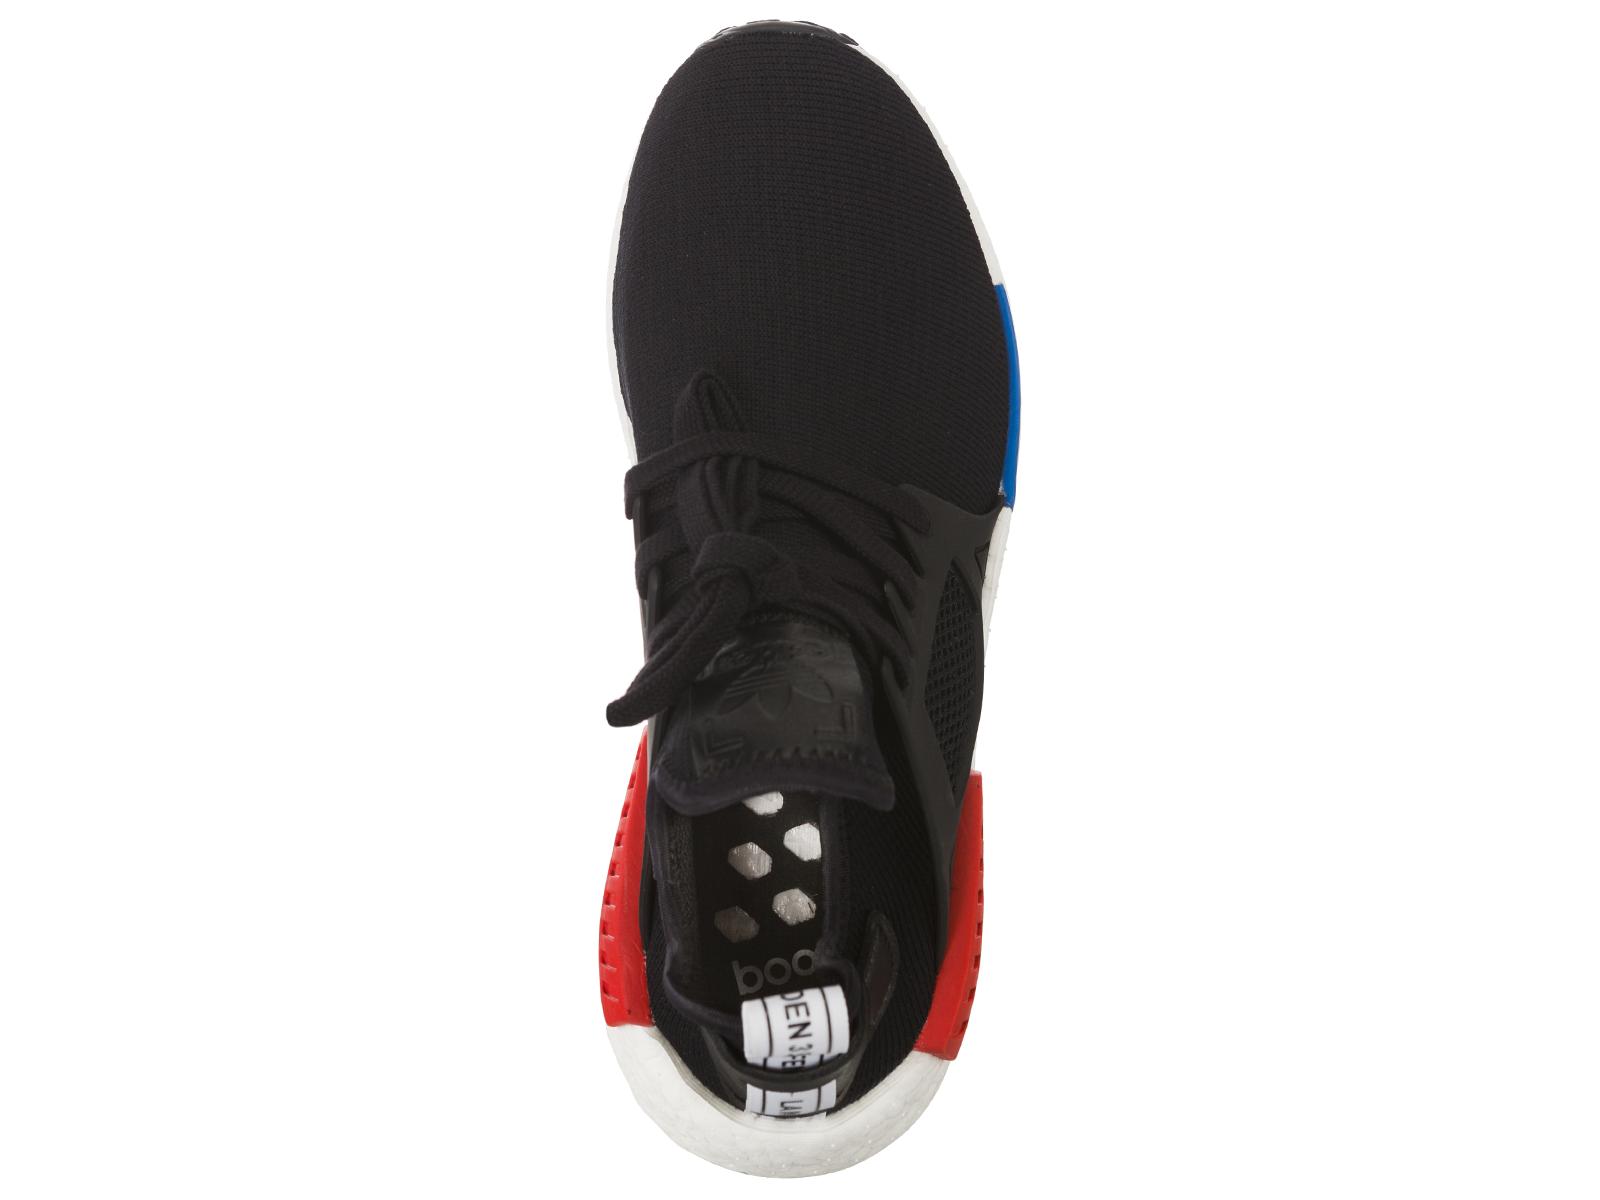 Adidas Originals Unisex Turnschuhe Schuhe Zu Kollektion 2017 Sneaker Nmd Details 0ZNnX8POkw